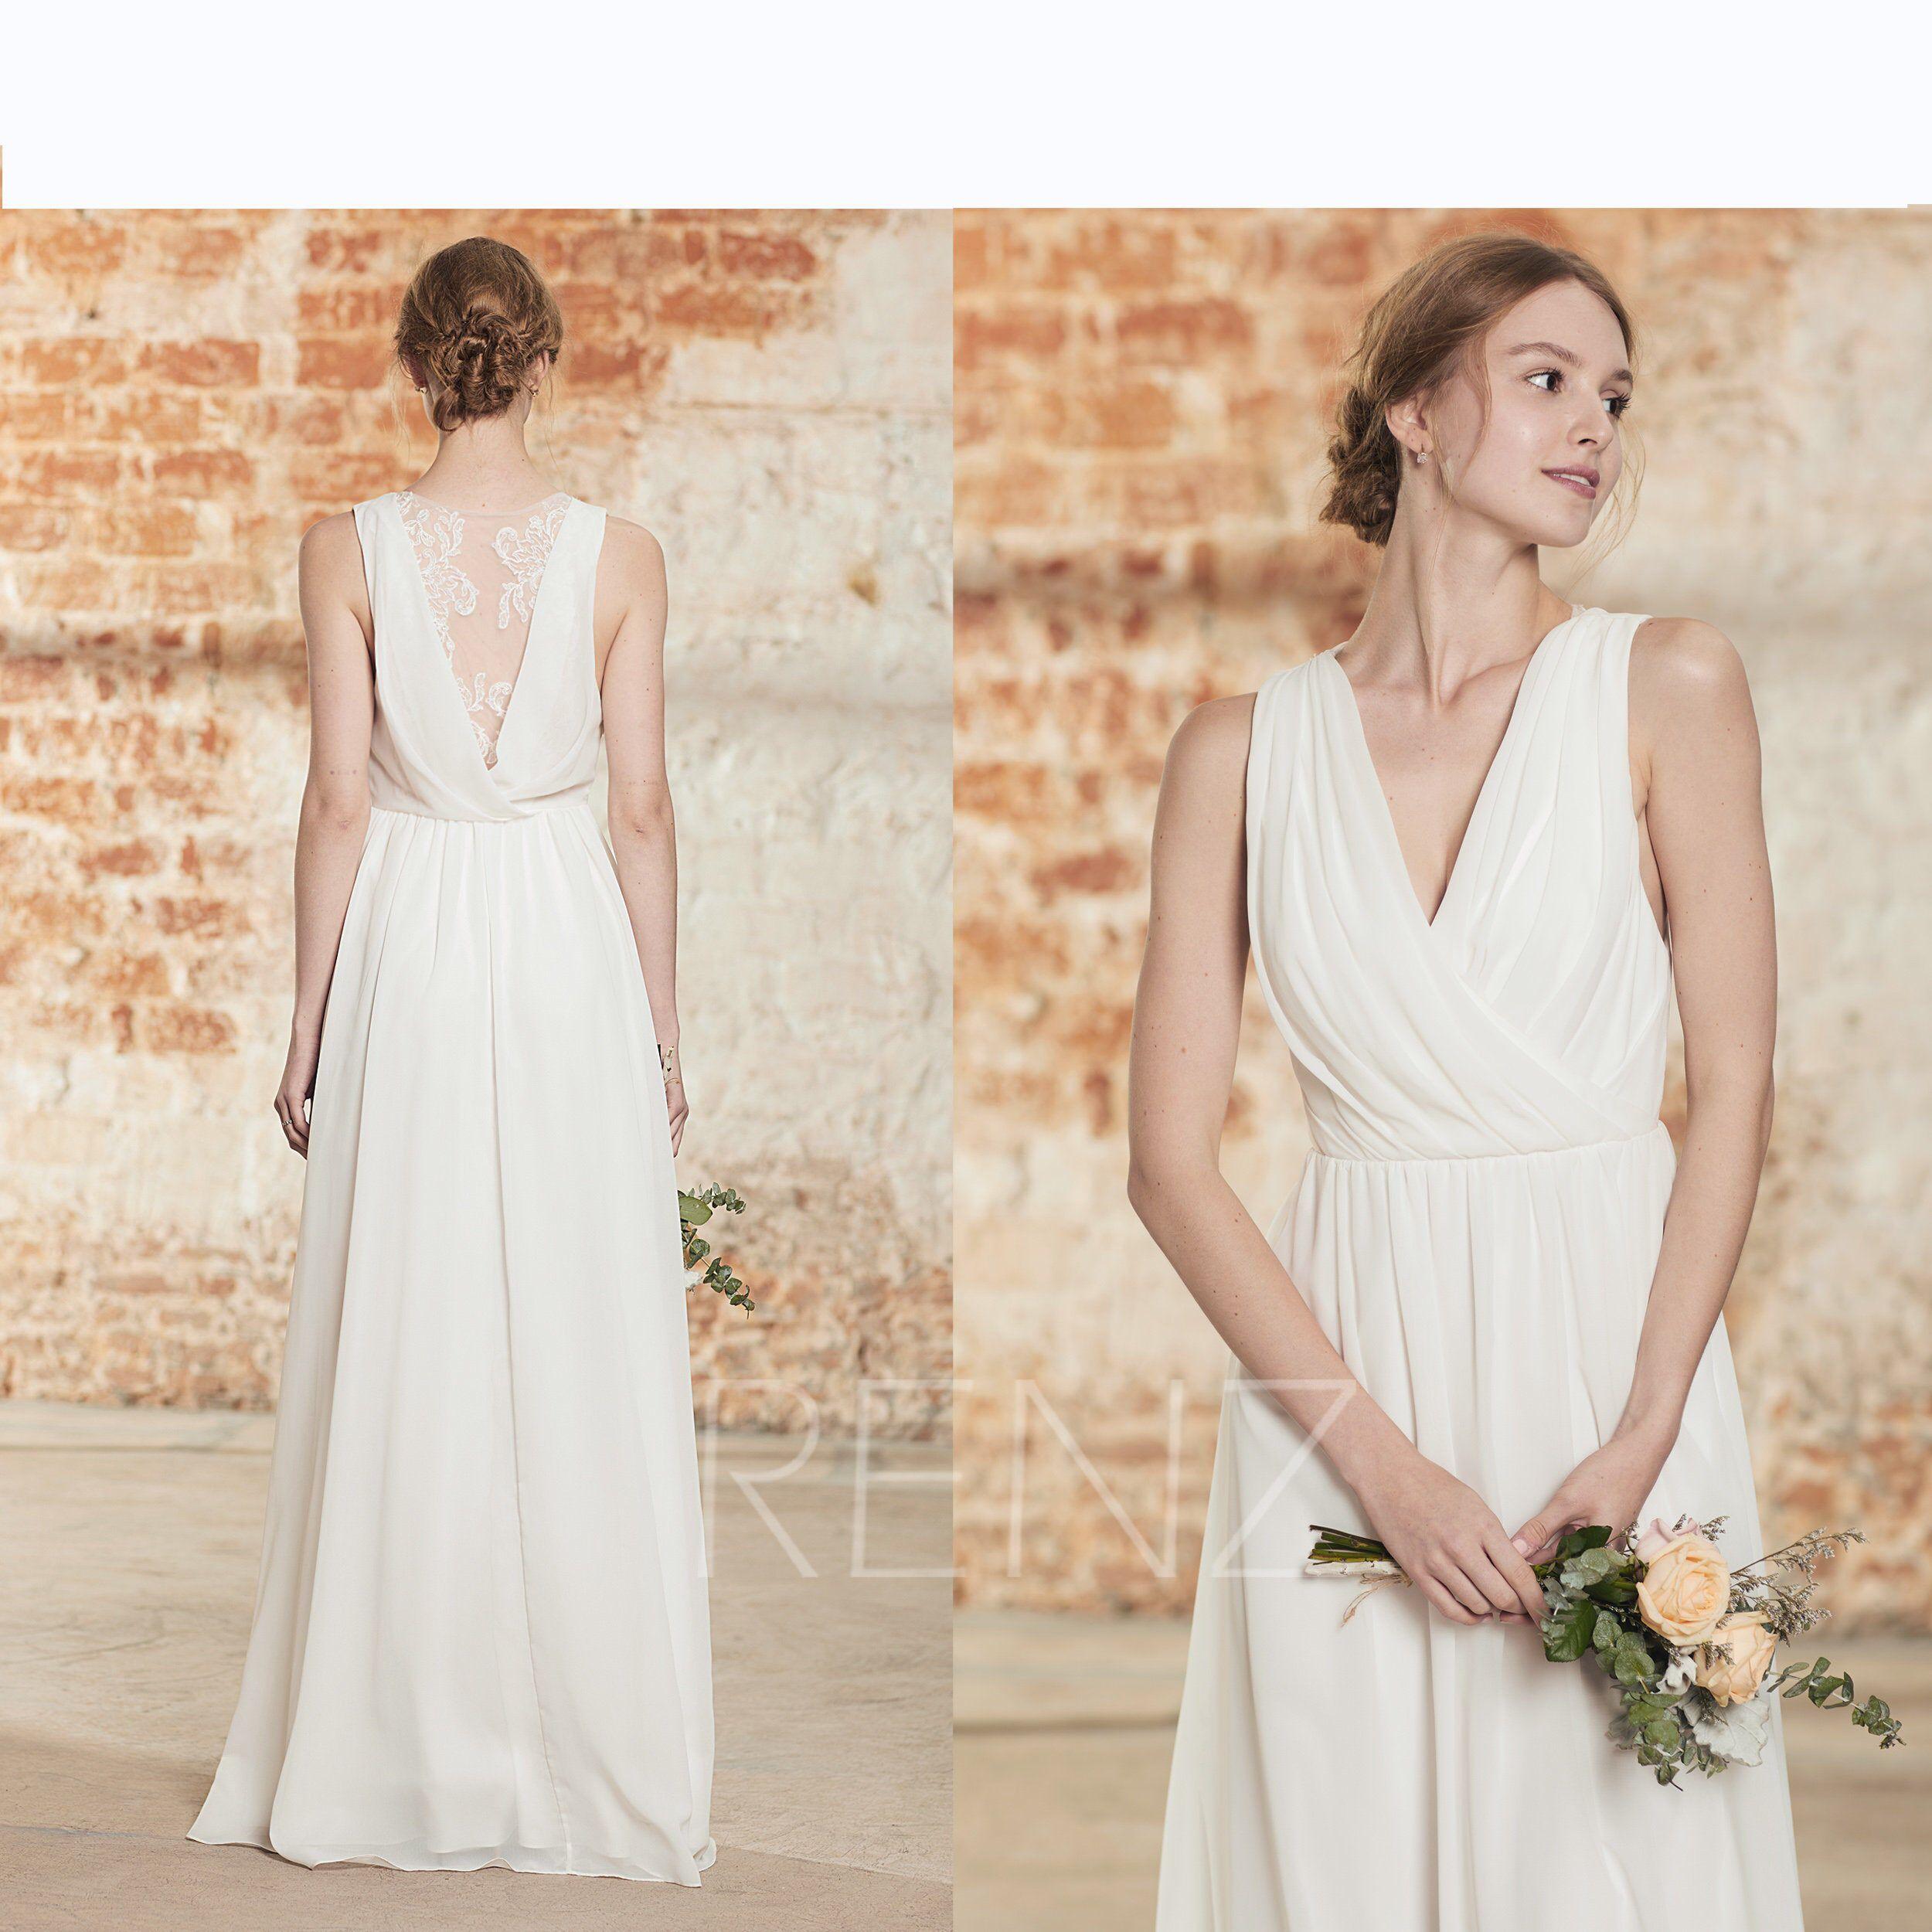 Simple Wedding Dress V Neck Long Chiffon White Bridesmaid